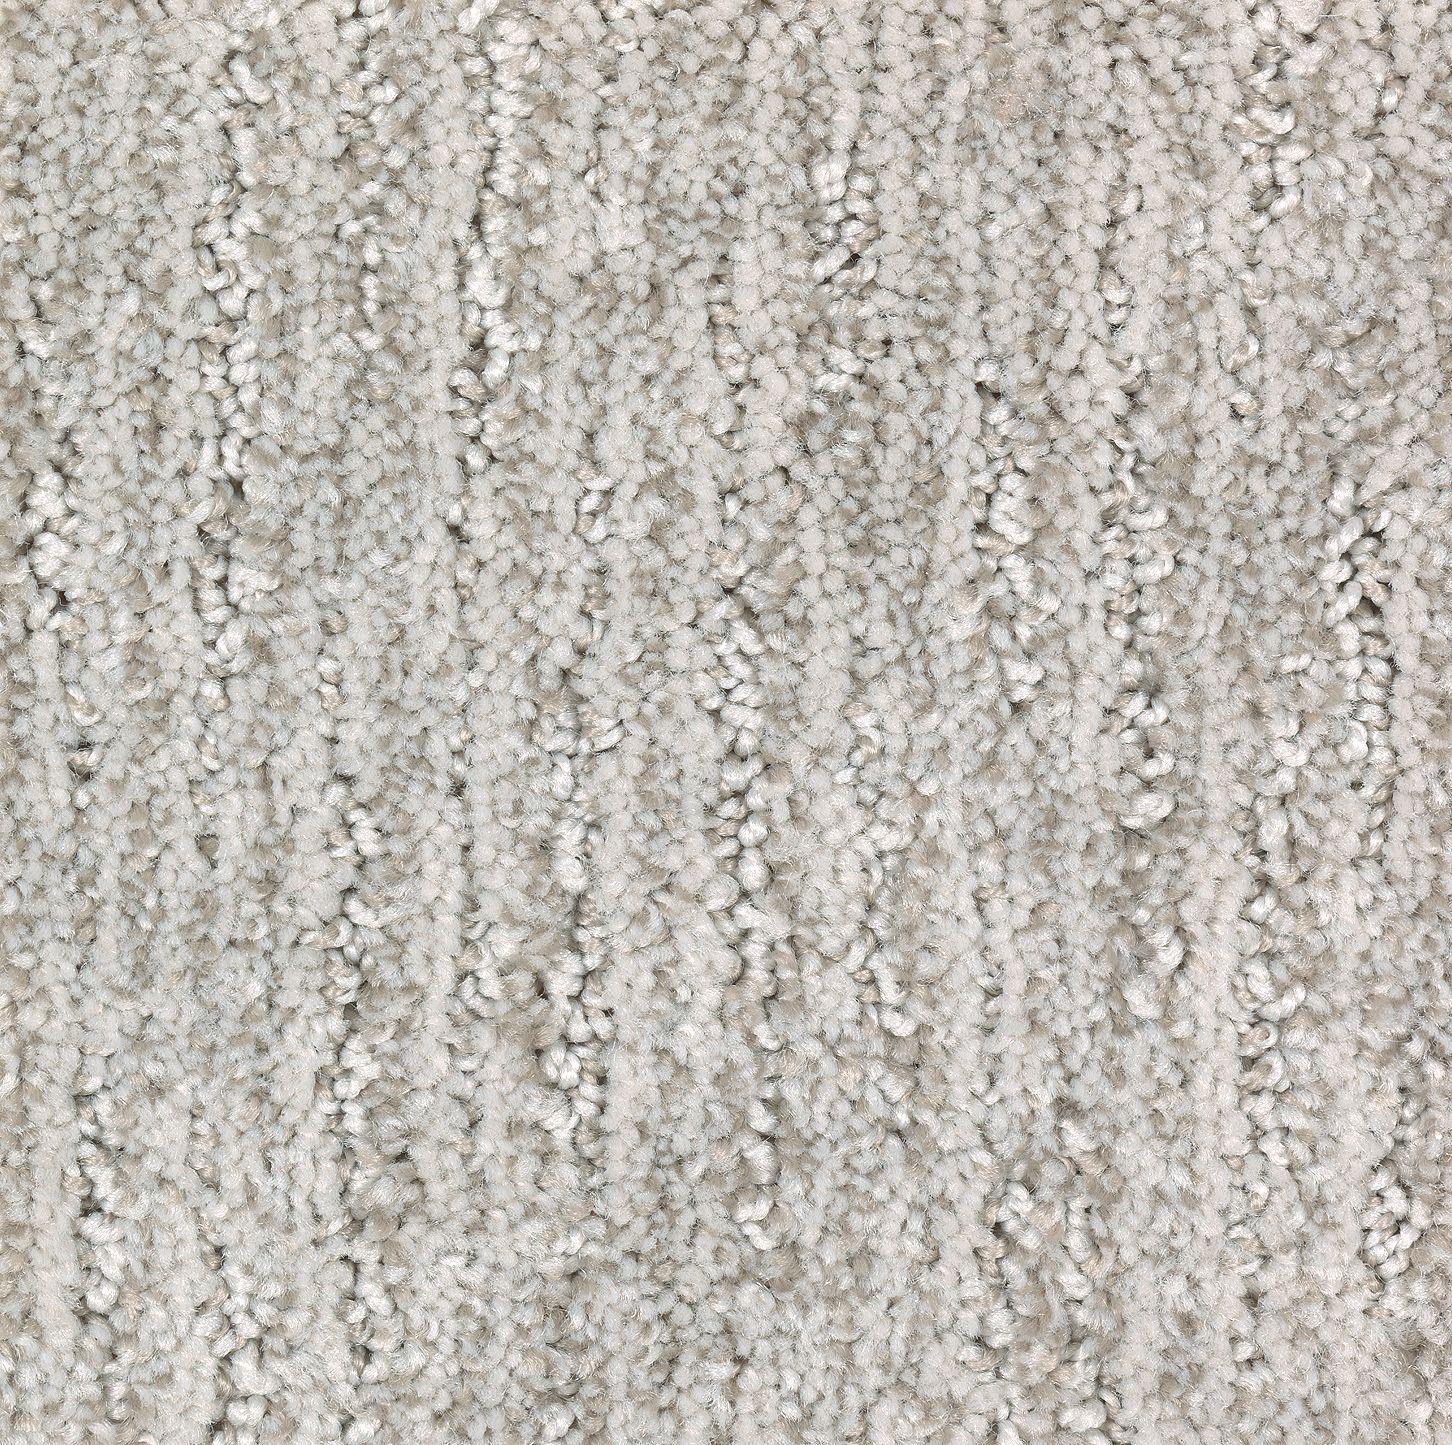 Pin By Cgleason On Westline Village Stainmaster Textured Carpet Carpet Samples